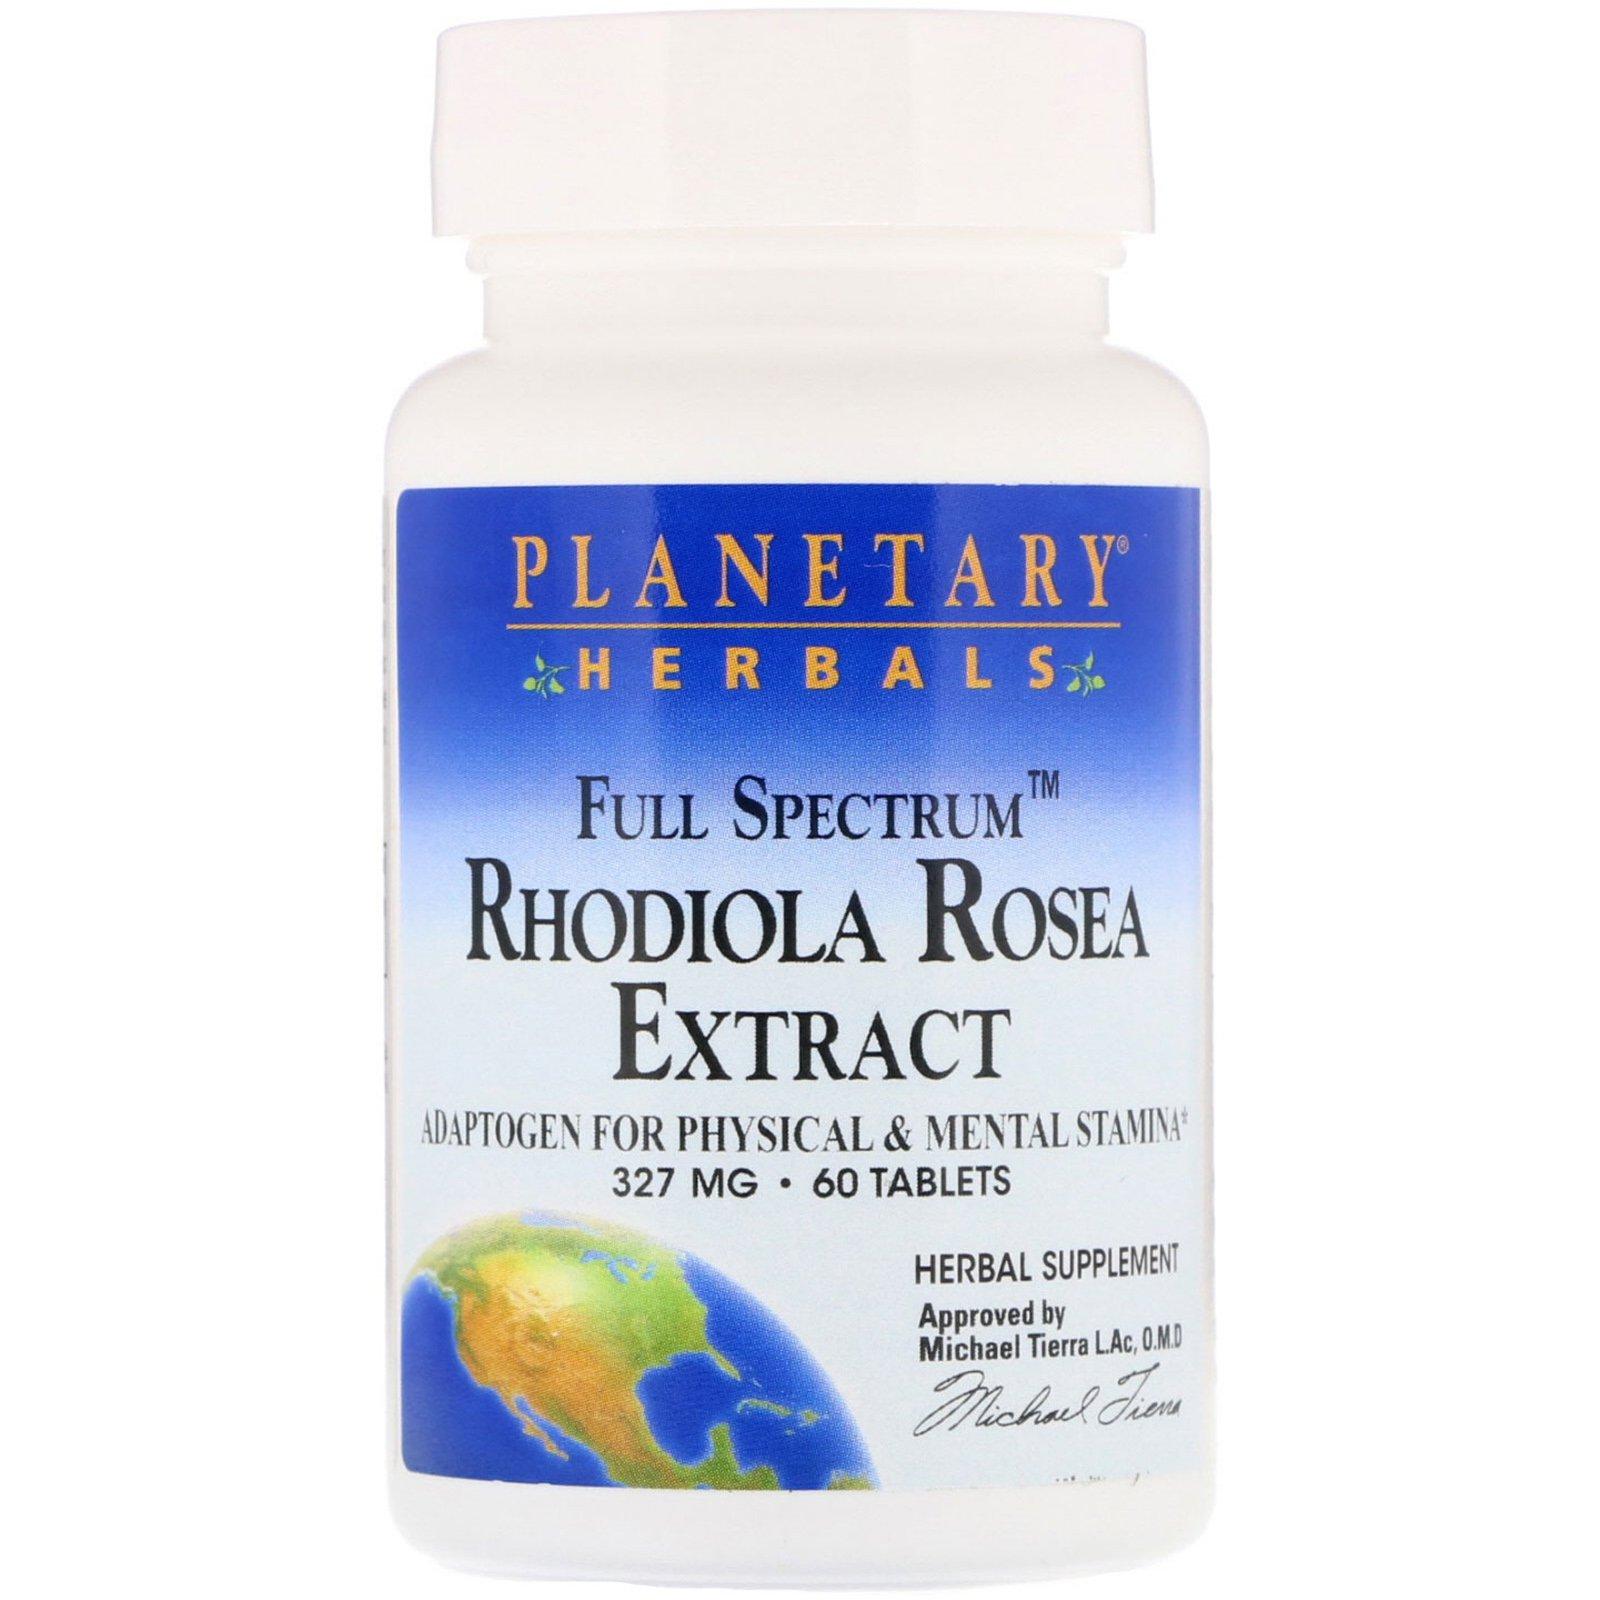 Planetary Herbals, экстракт родиолы розовой, полного спектра, 327 мг, 60 таблеток